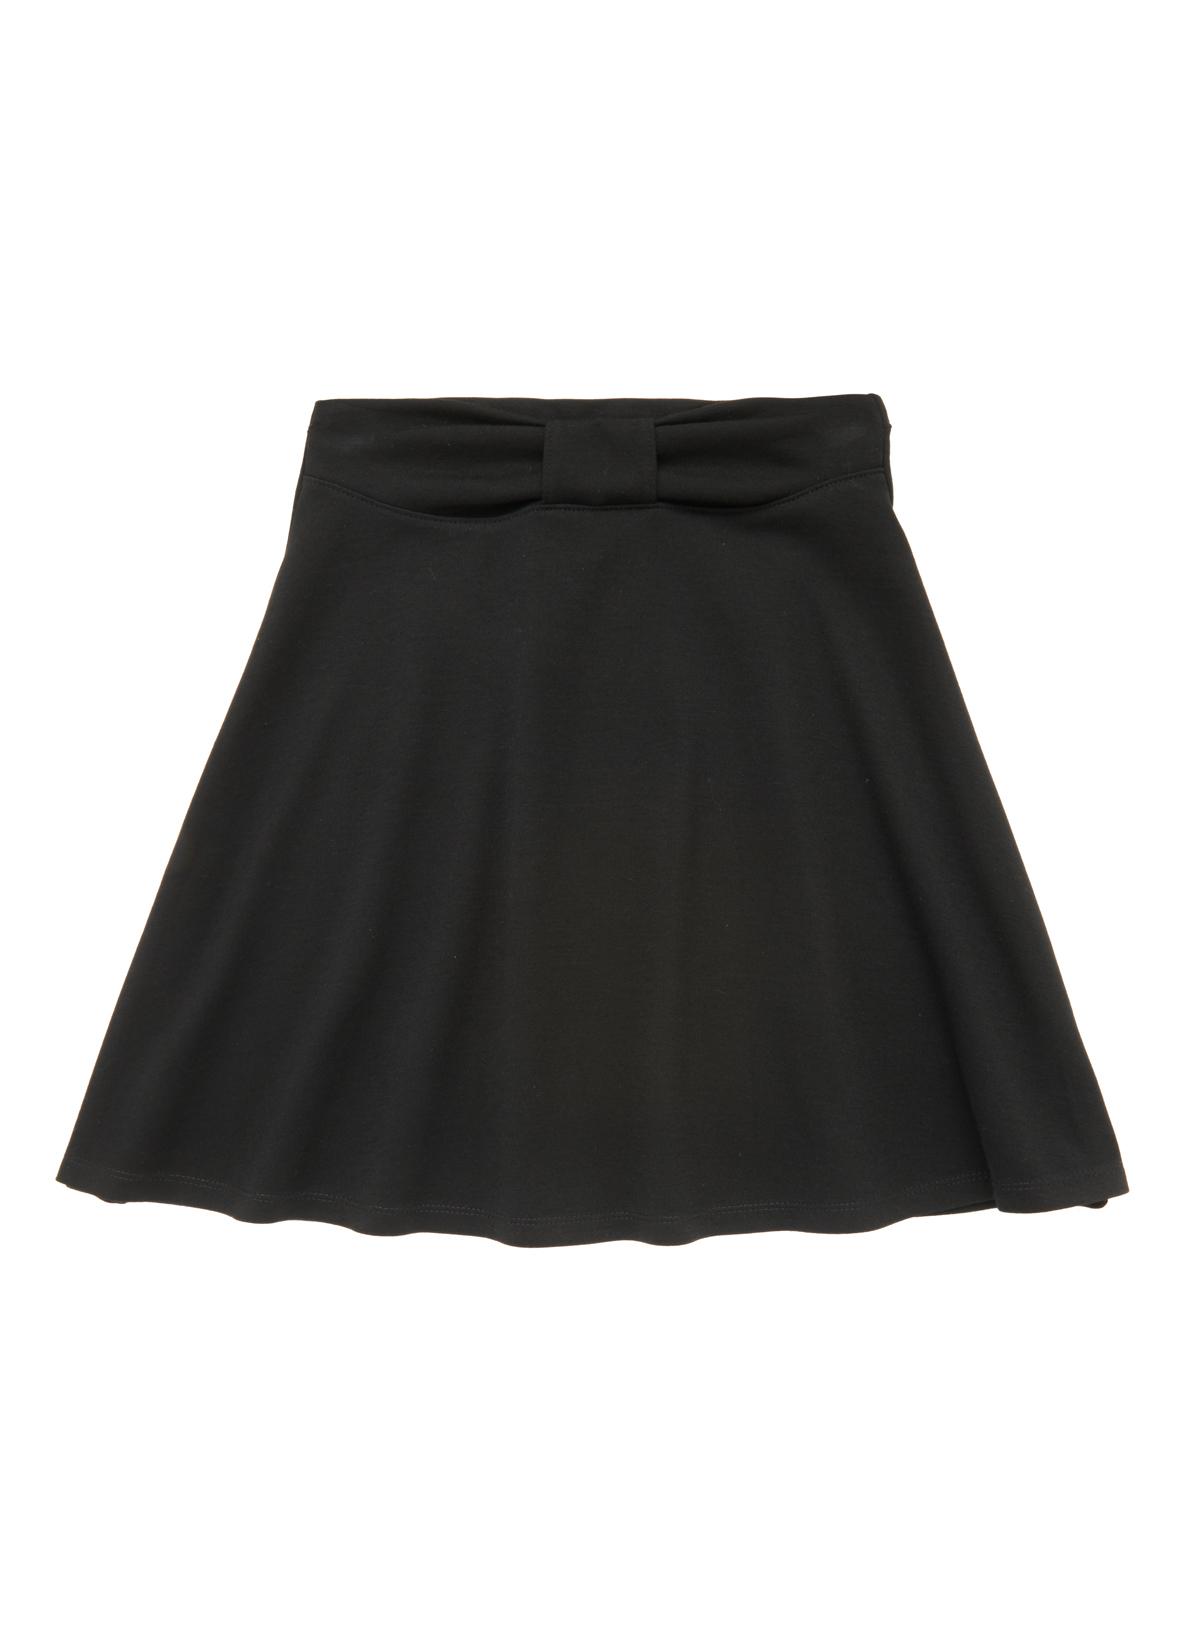 Kids Girls Black Skater Skirt (10-16 years) | Tu clothing